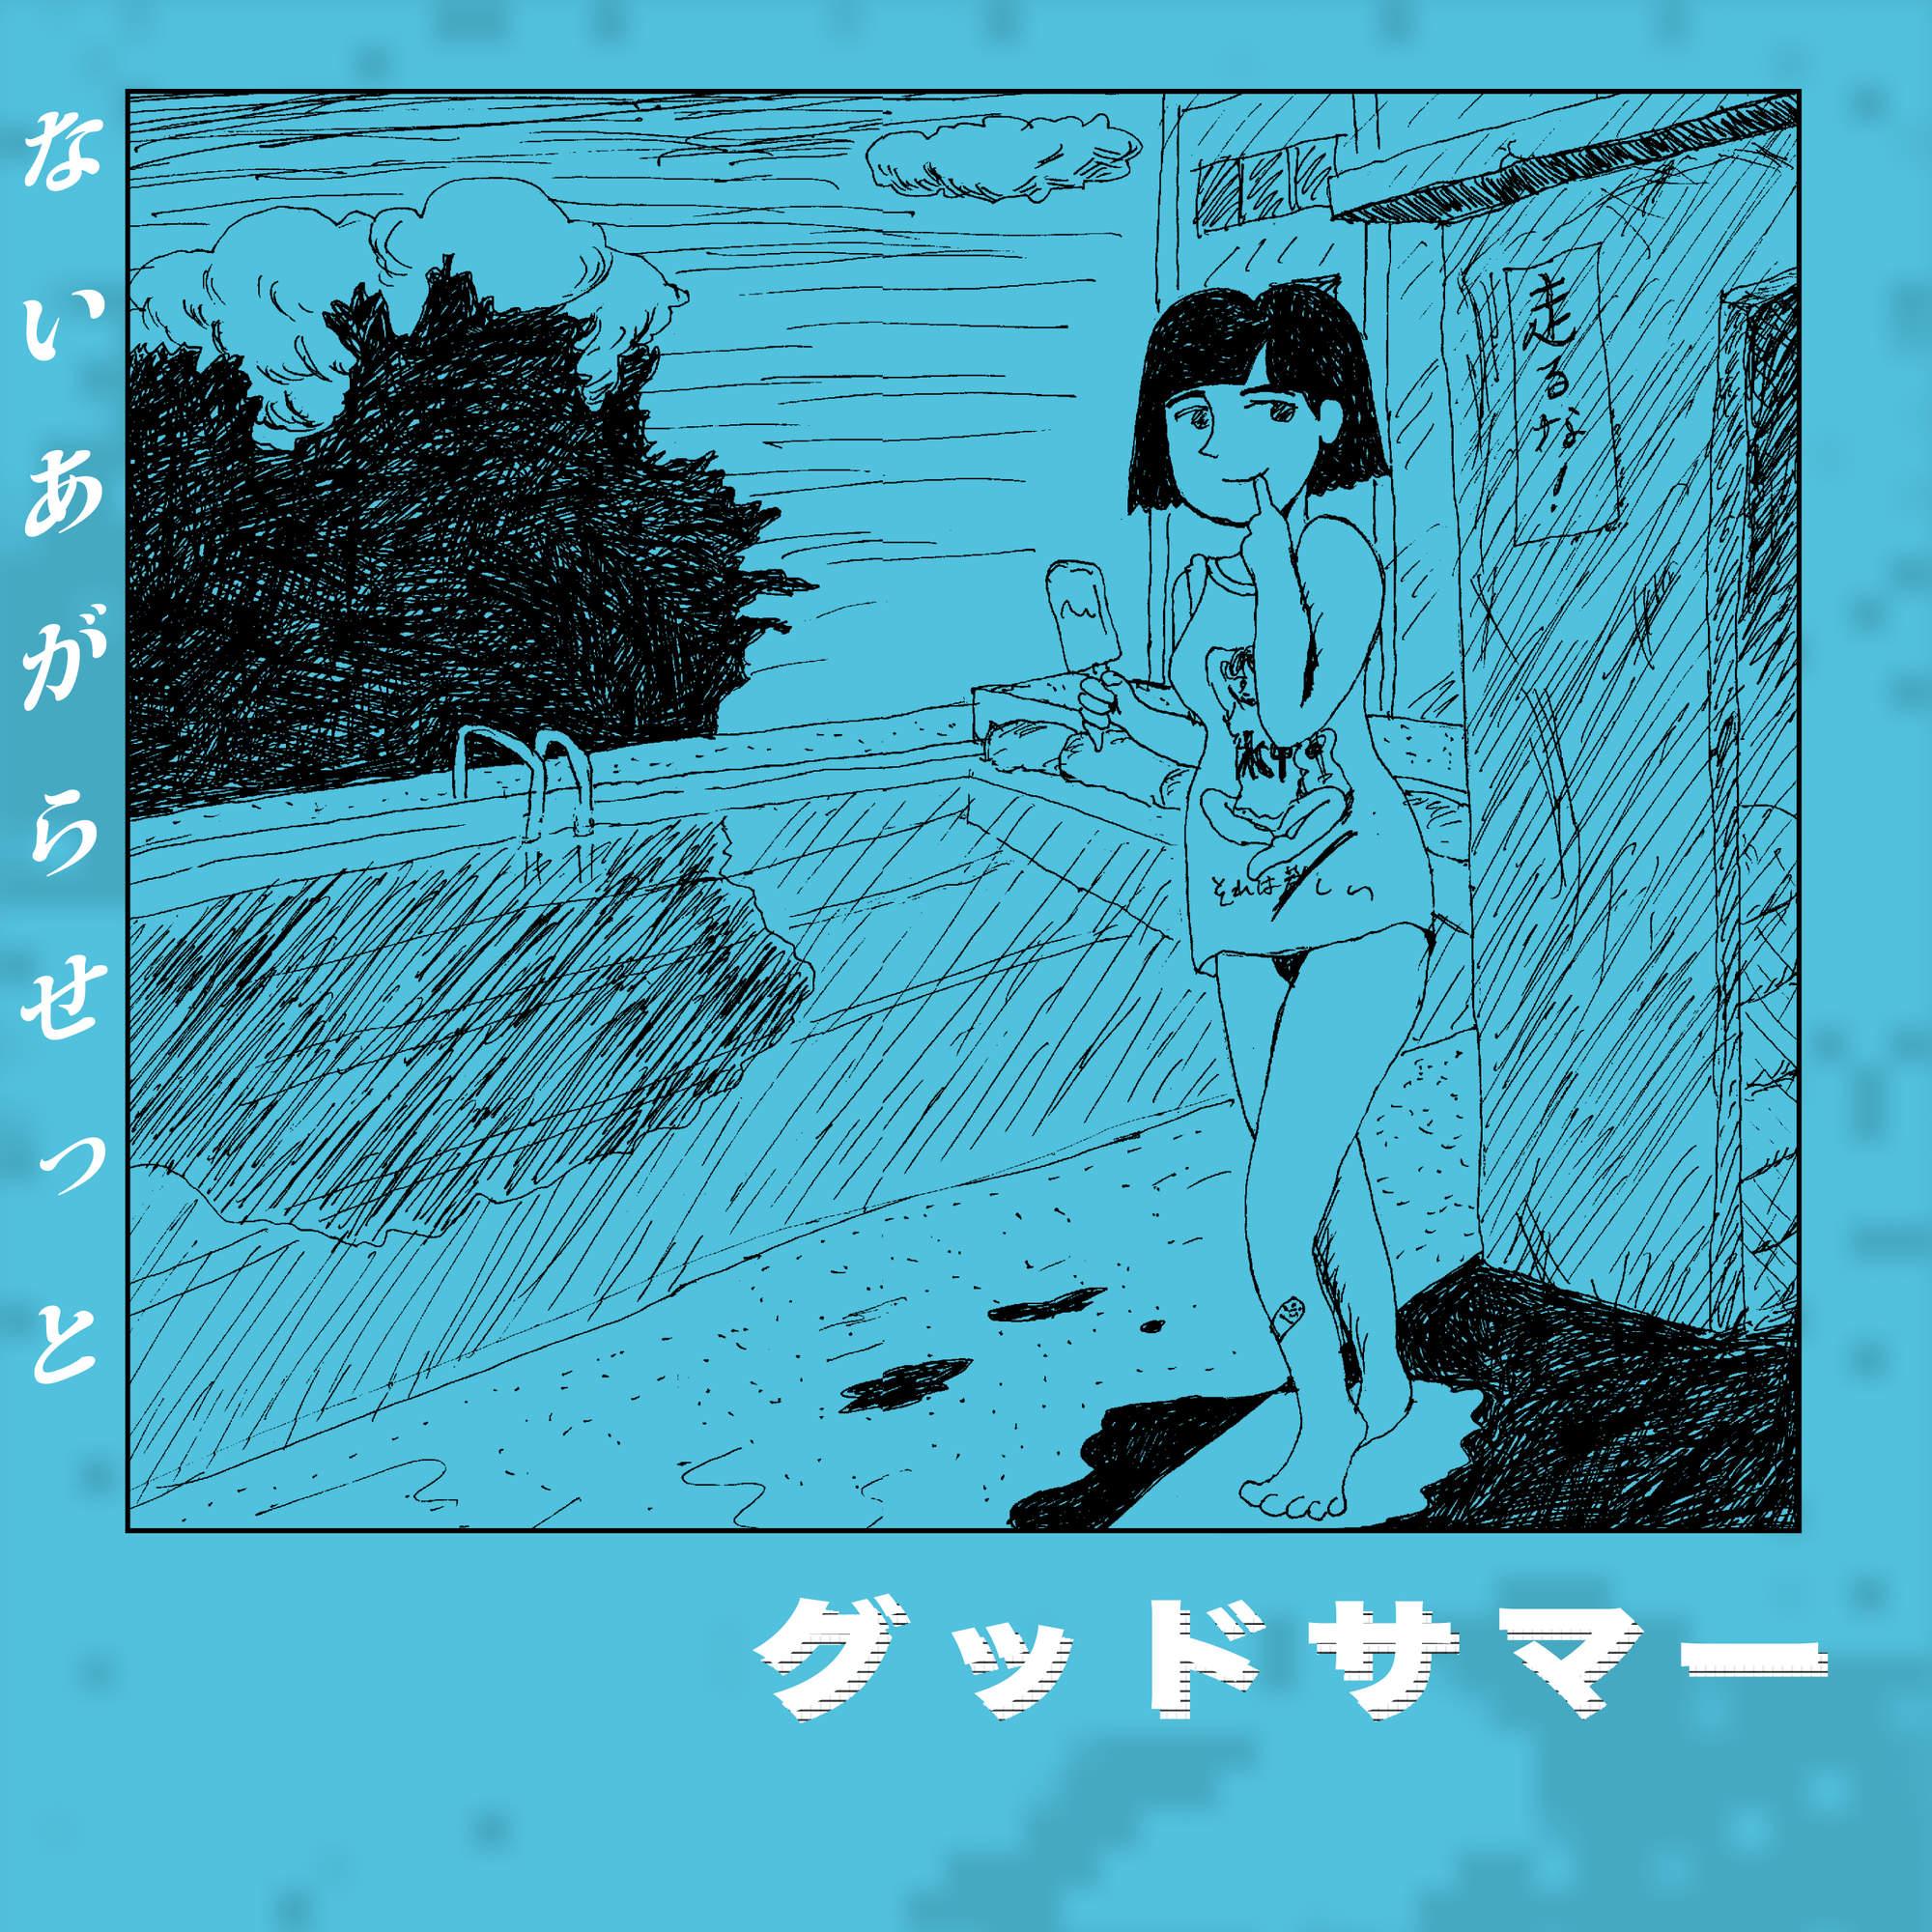 http://rose-records.jp/files/20210820233037.jpg